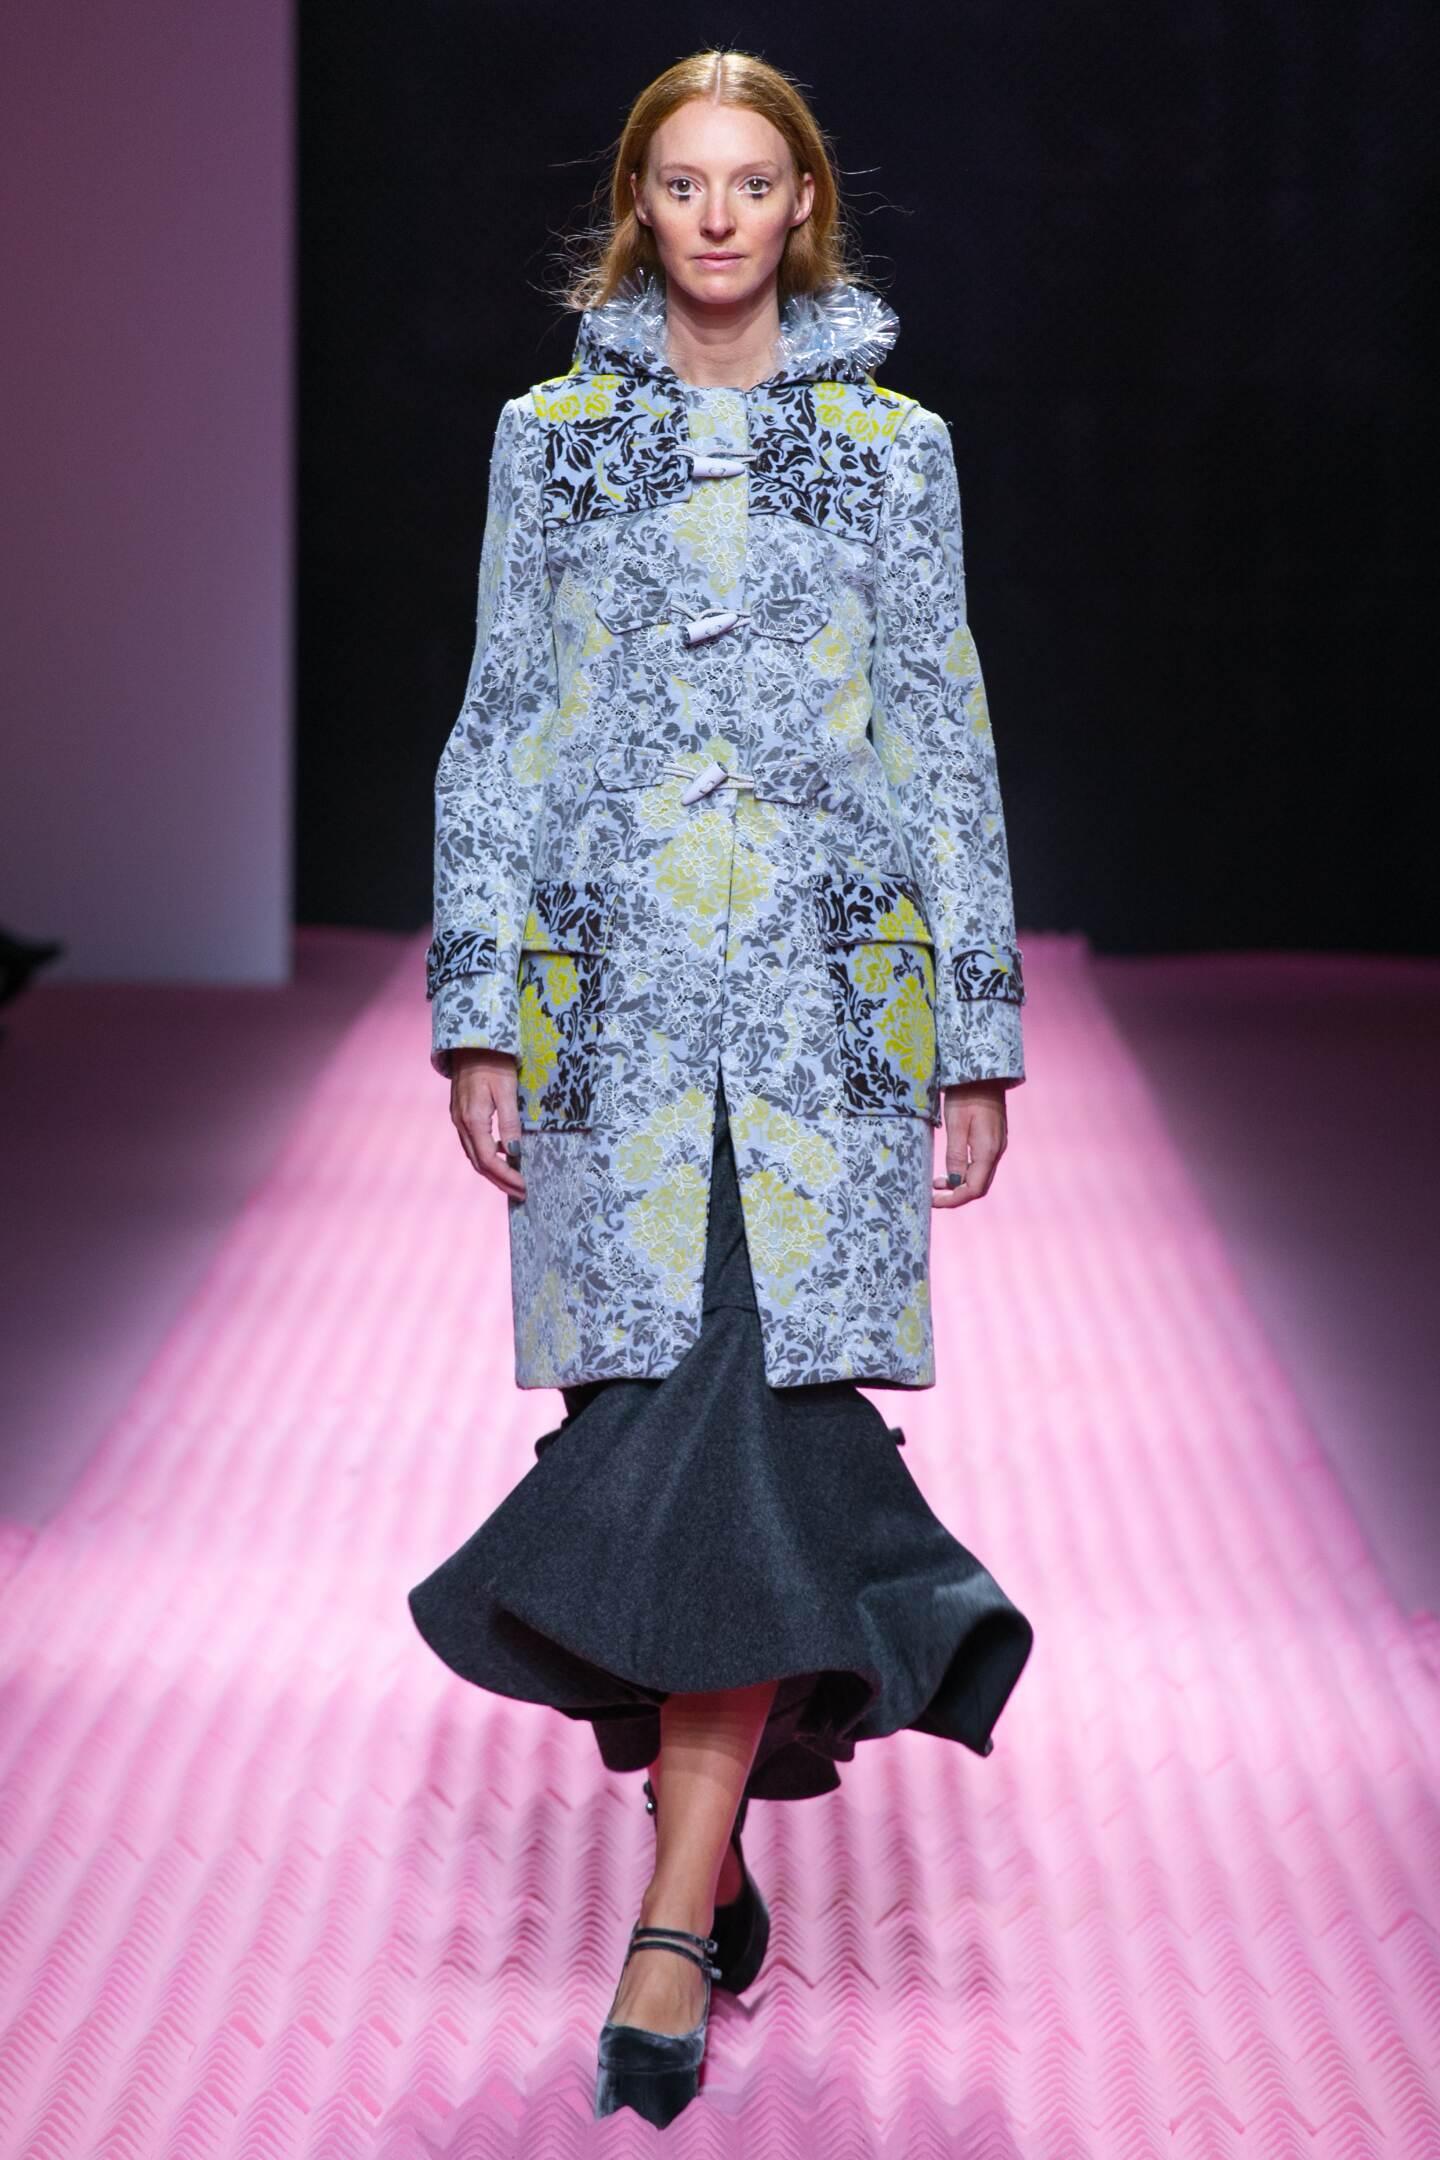 Mary Katrantzou Fall Winter 2015 16 Women's Collection London Fashion Week Fashion Show